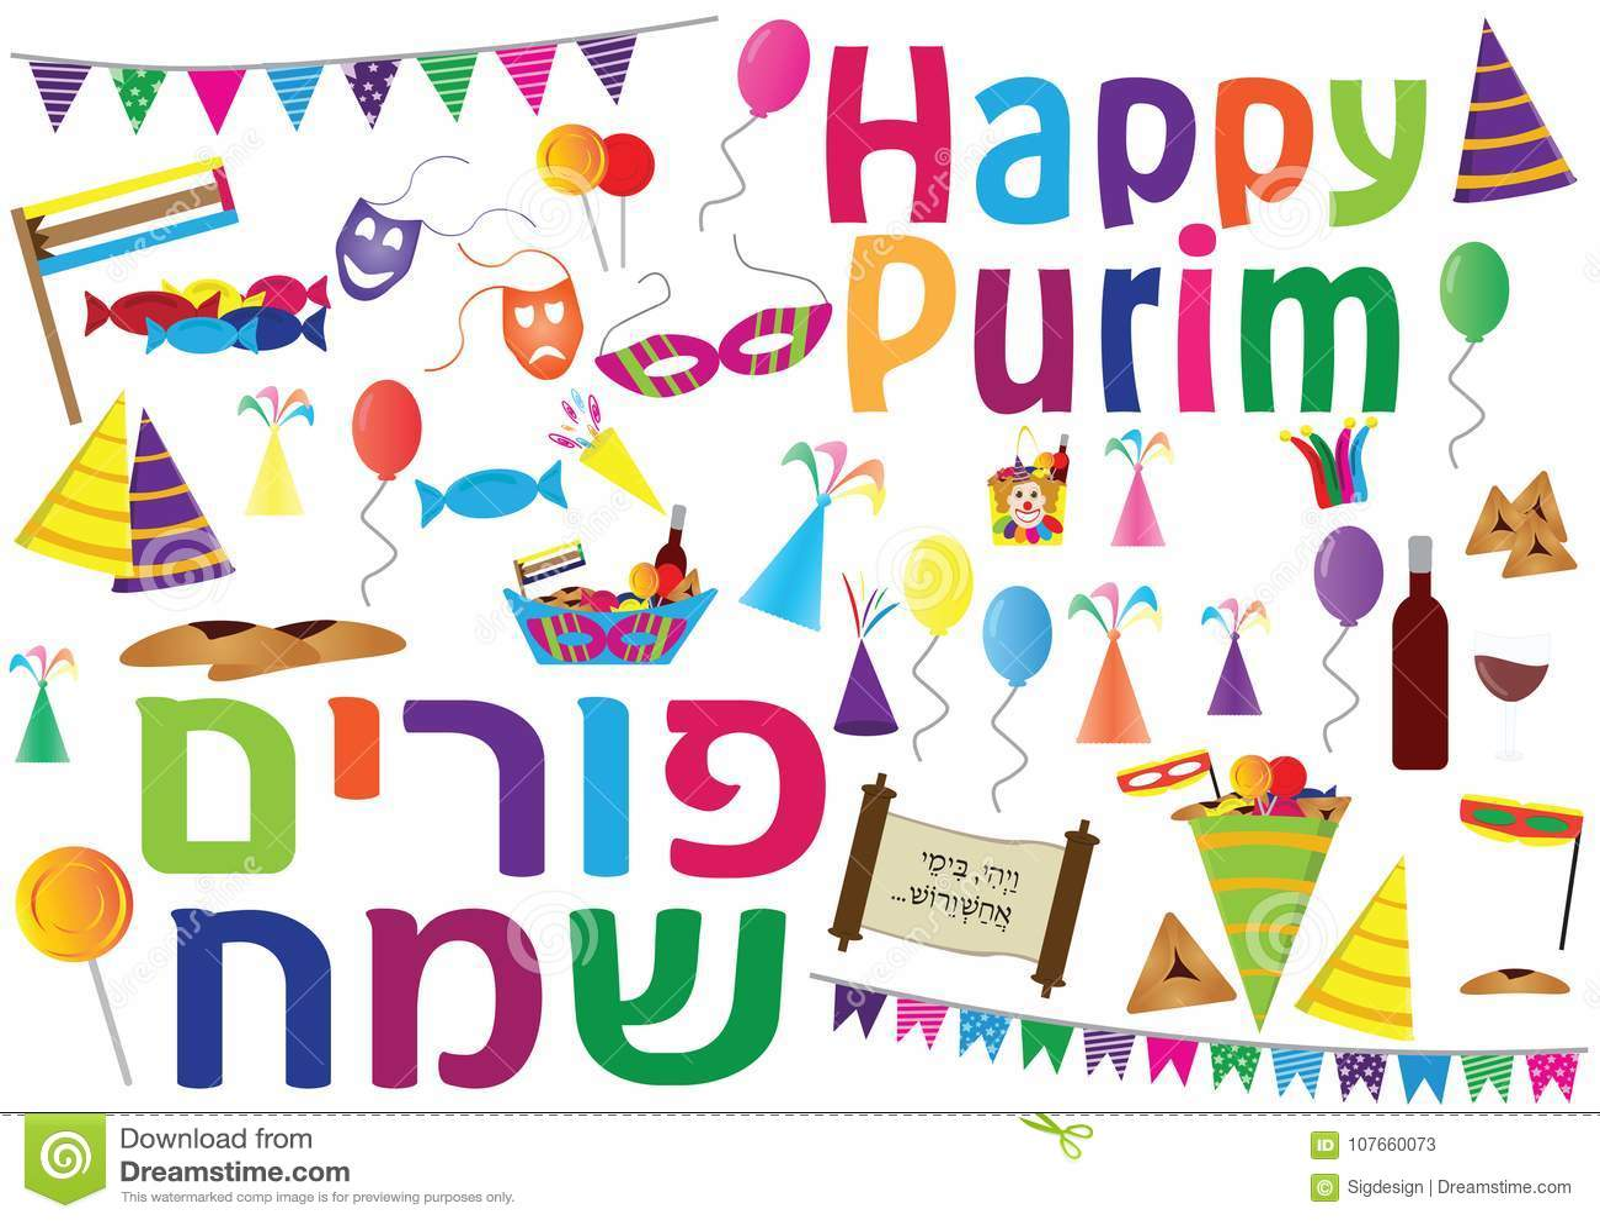 Purim jewish holiday cliparts icon vectoe set stock vector purim jewish holiday cliparts icon vectoe set hebrew and english greeting card elements m4hsunfo